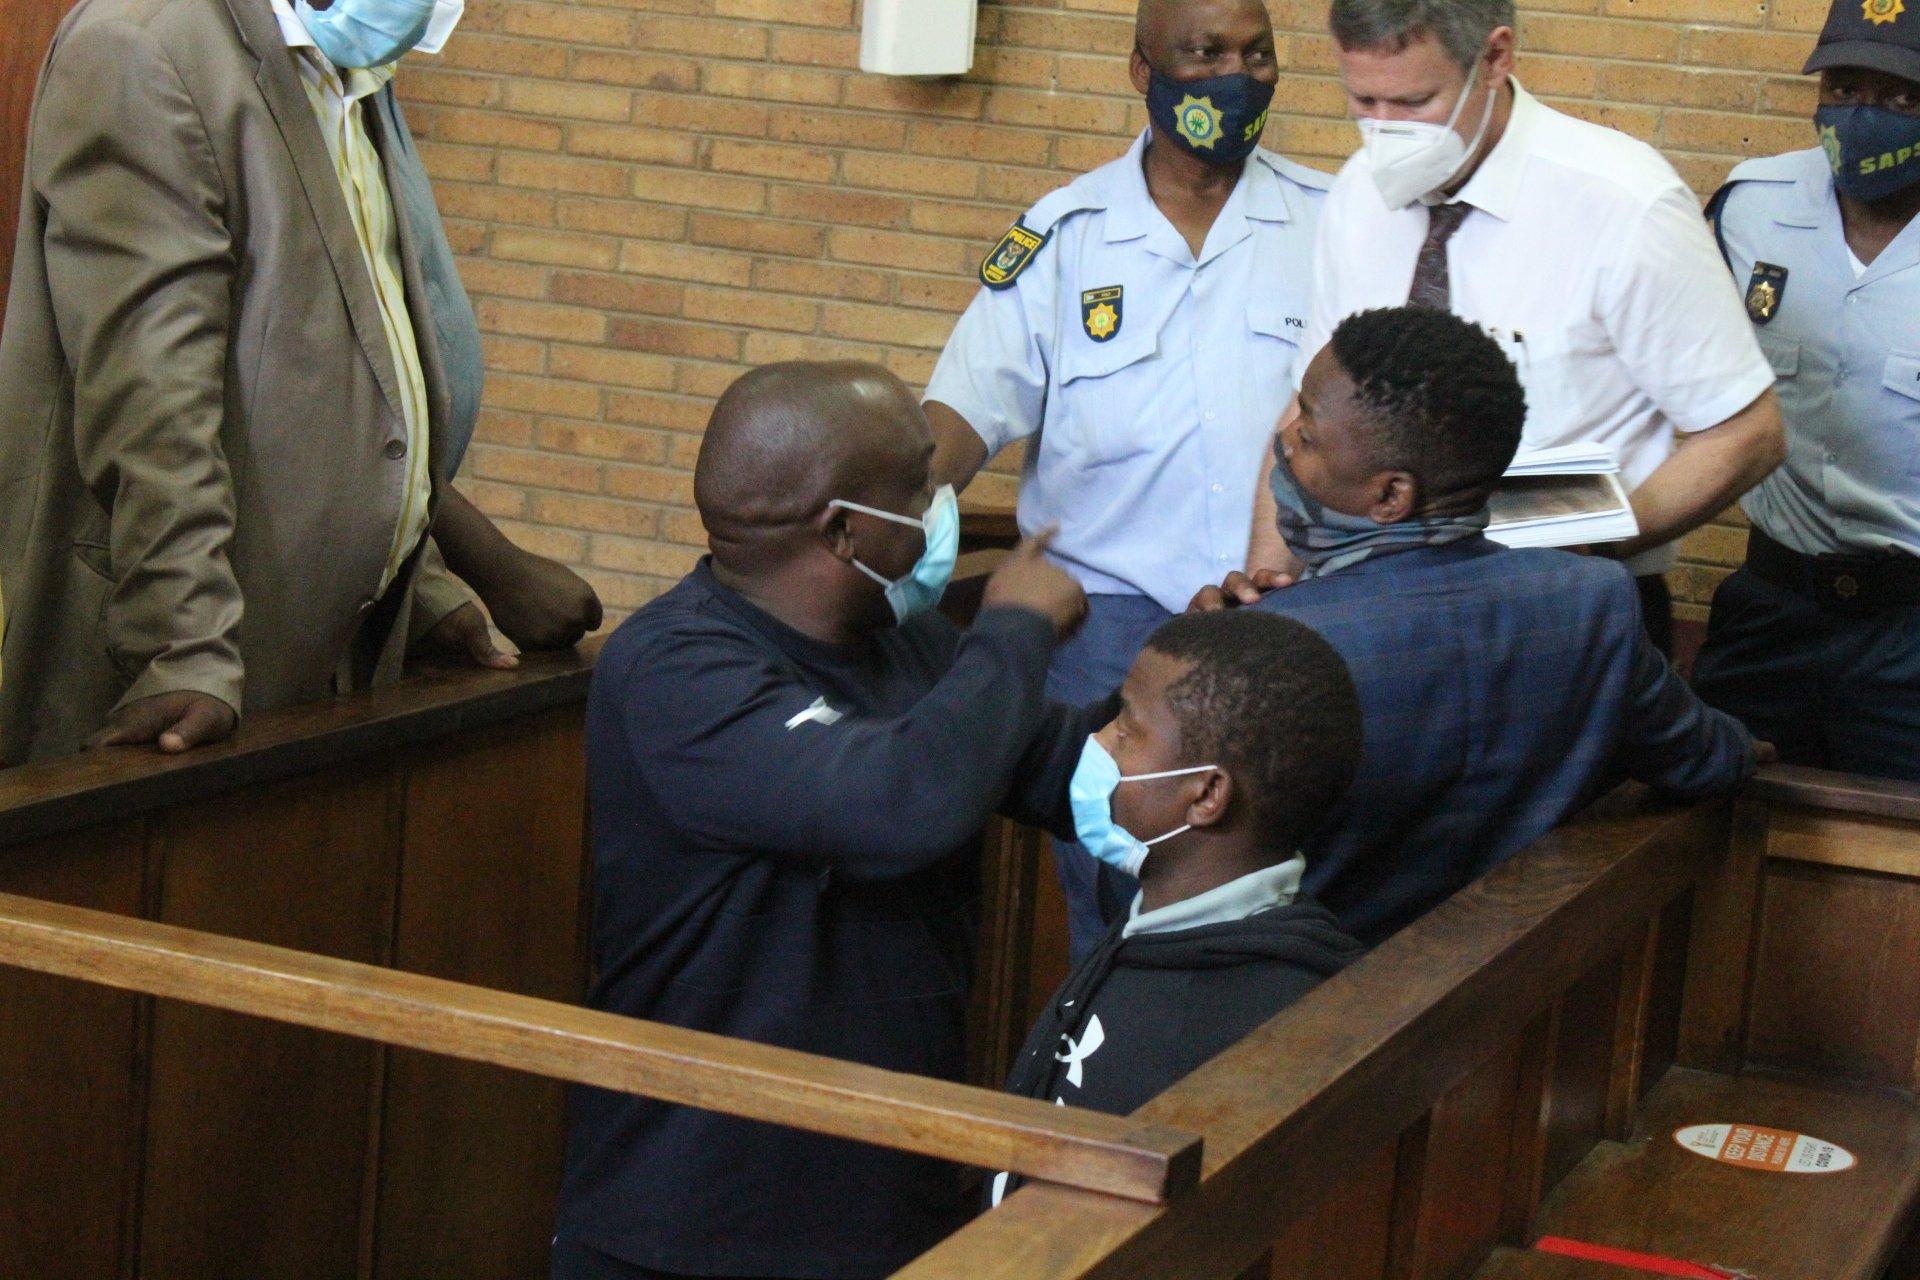 Mandla Msibi to spend weekend behind bars as he waits on bail decision